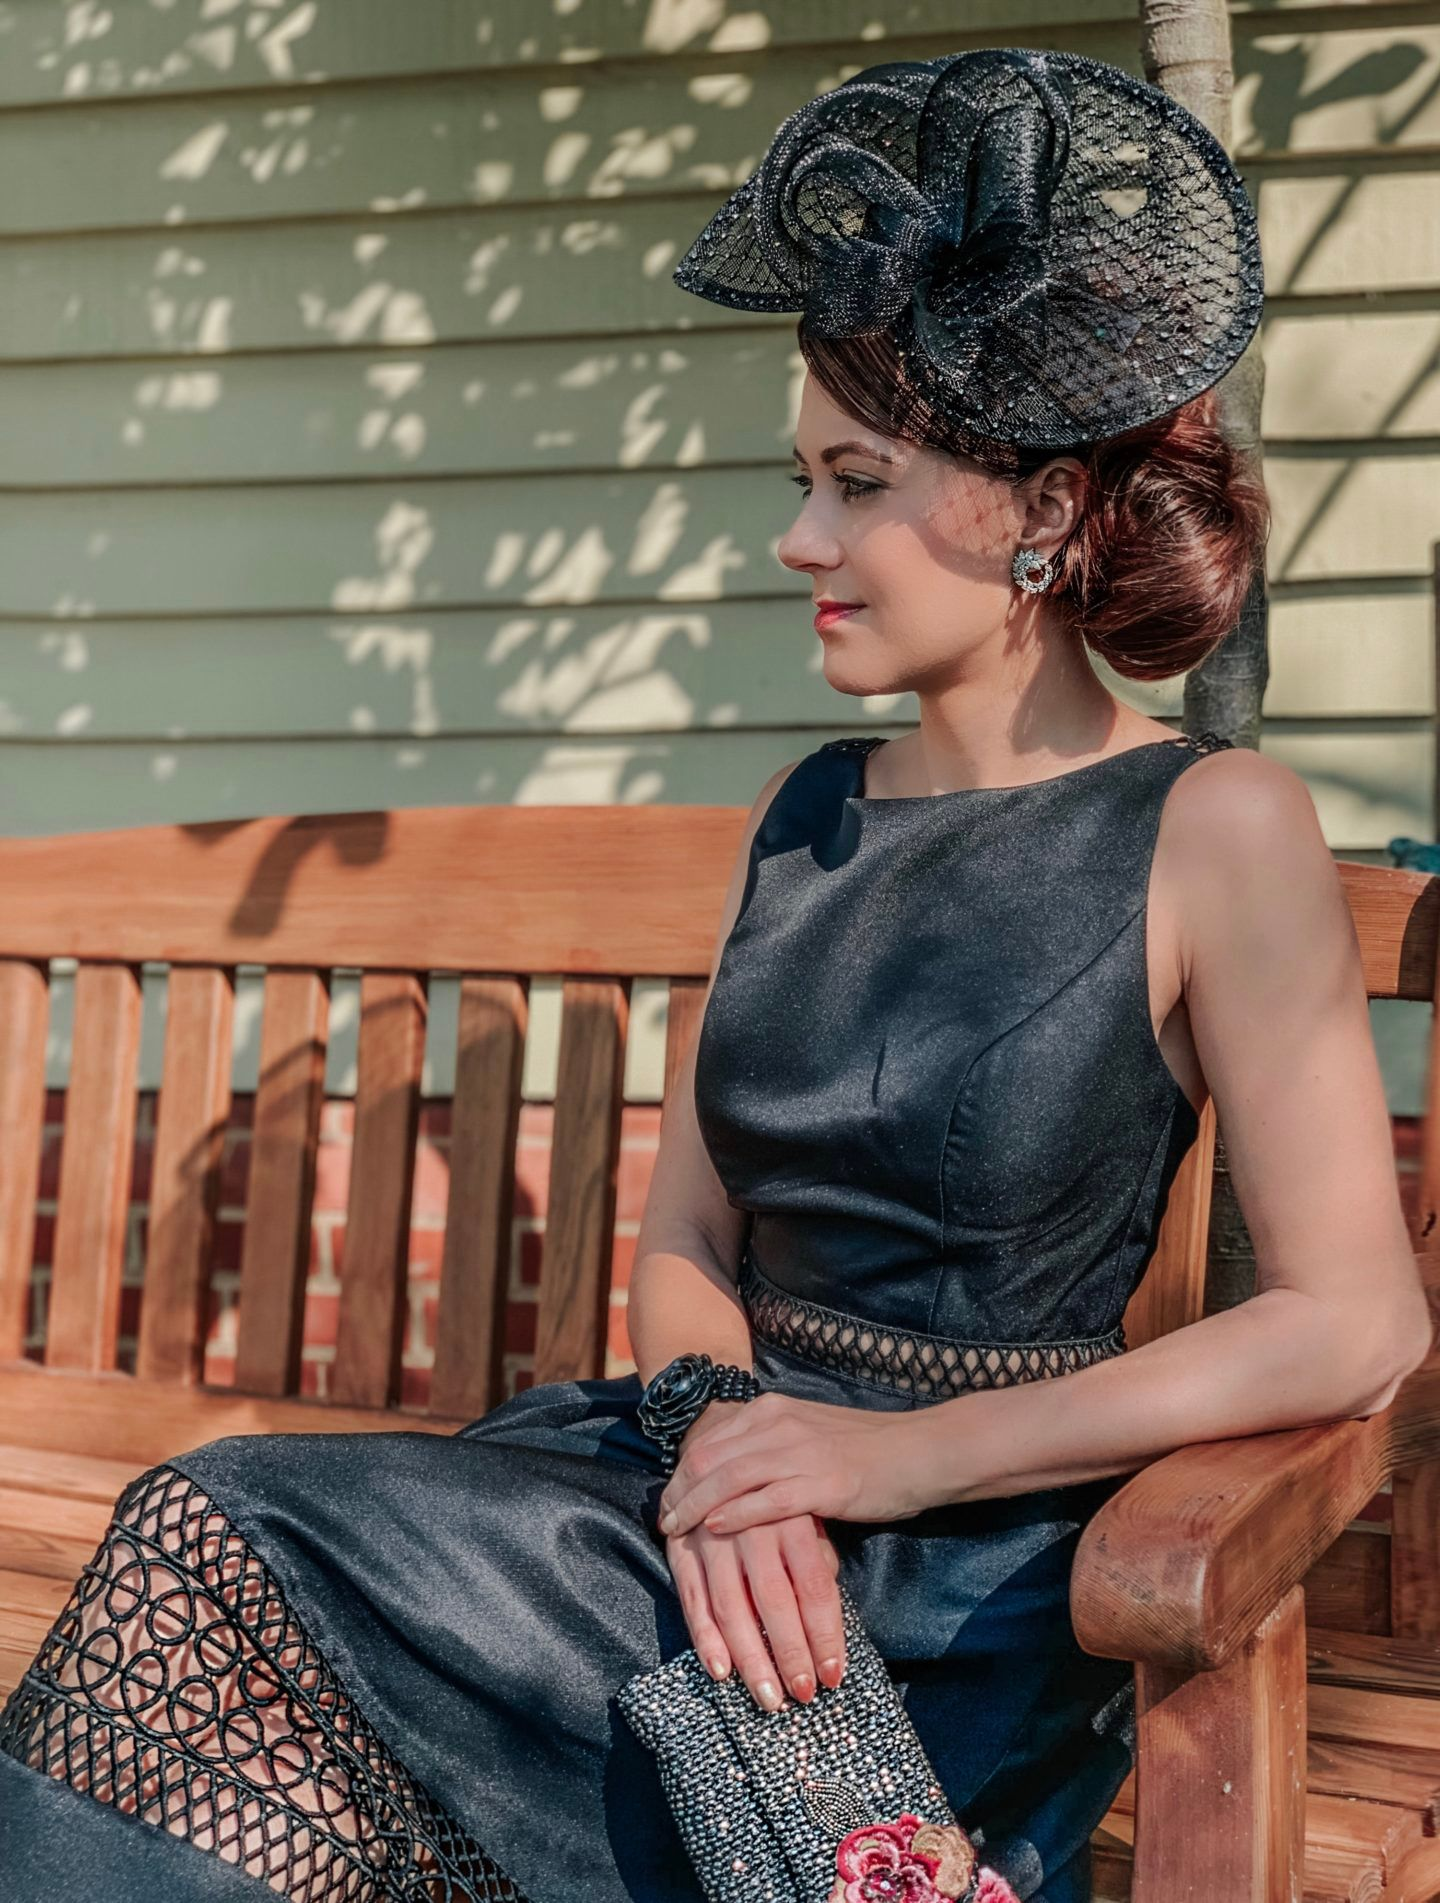 Chi Chi London Tall structured midi dress with lace inserts in black | Lipsy Diamanté Fascinator | Swarovski Earrings | Kurt Geiger Jewelled Heeled Mules | Monsoon bag | Charlotte Tilbury make up